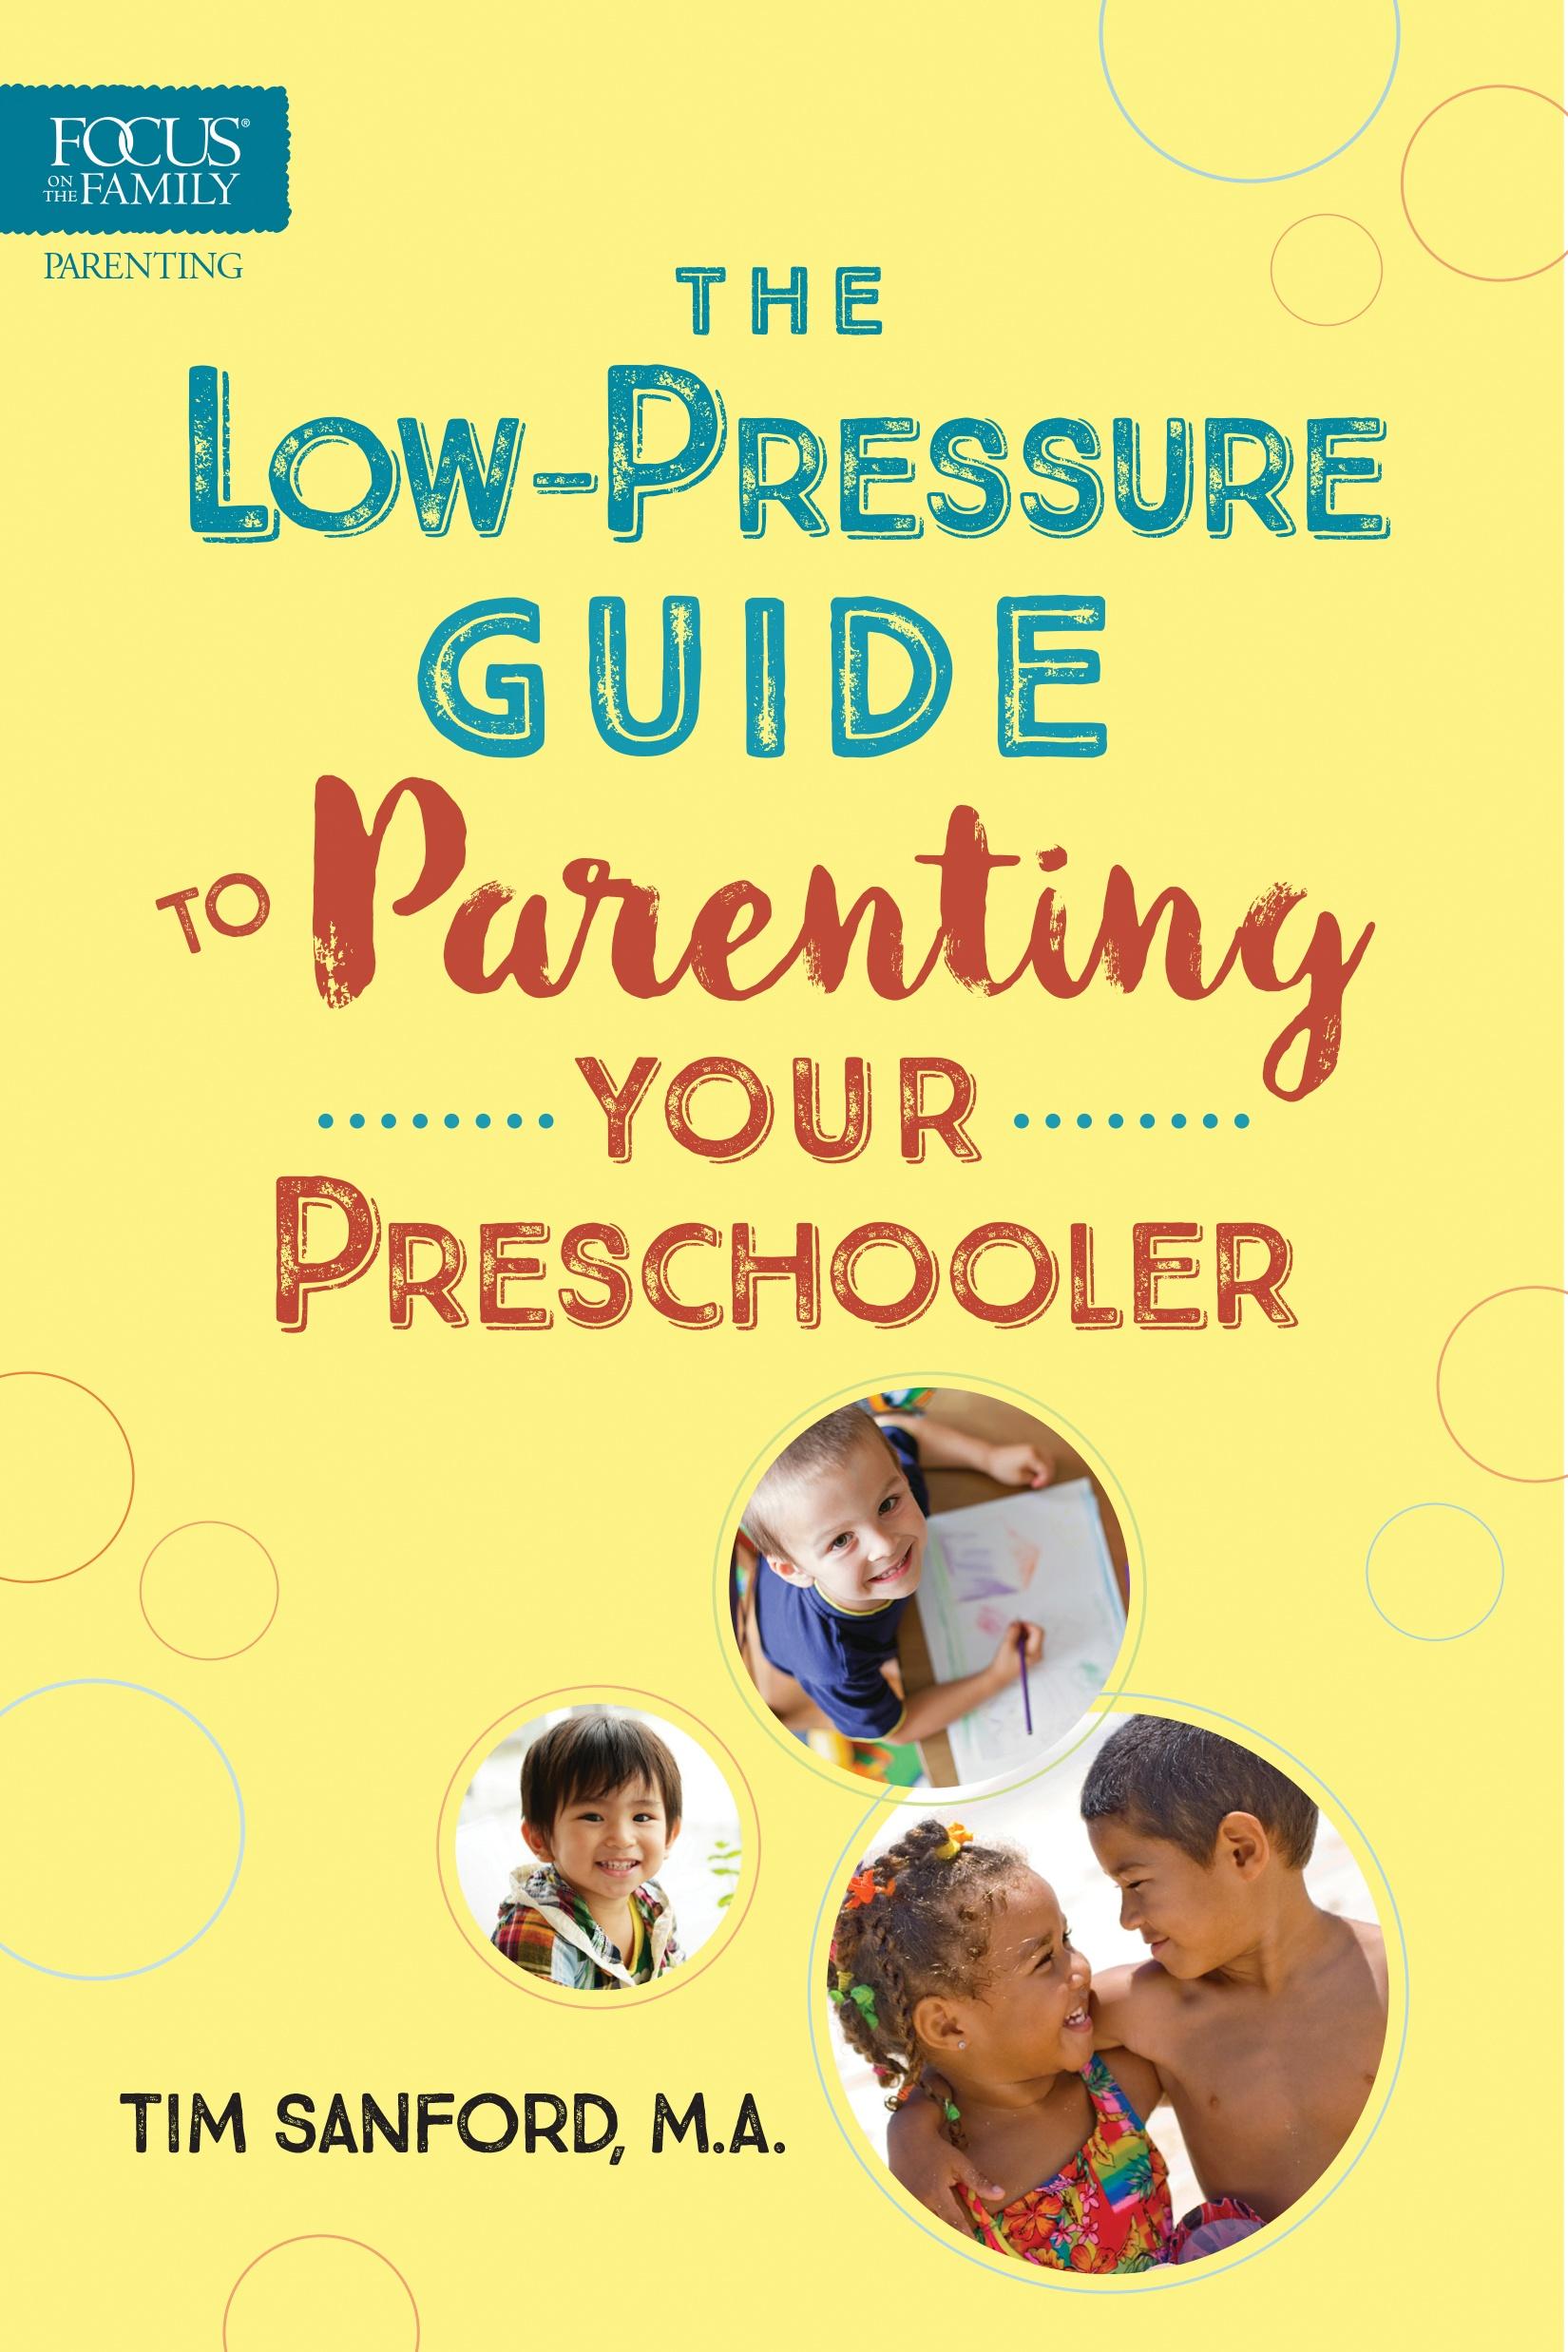 Week 2 -F01611B The Low-Pressure Guide to Parenting Your Preschooler.jpg